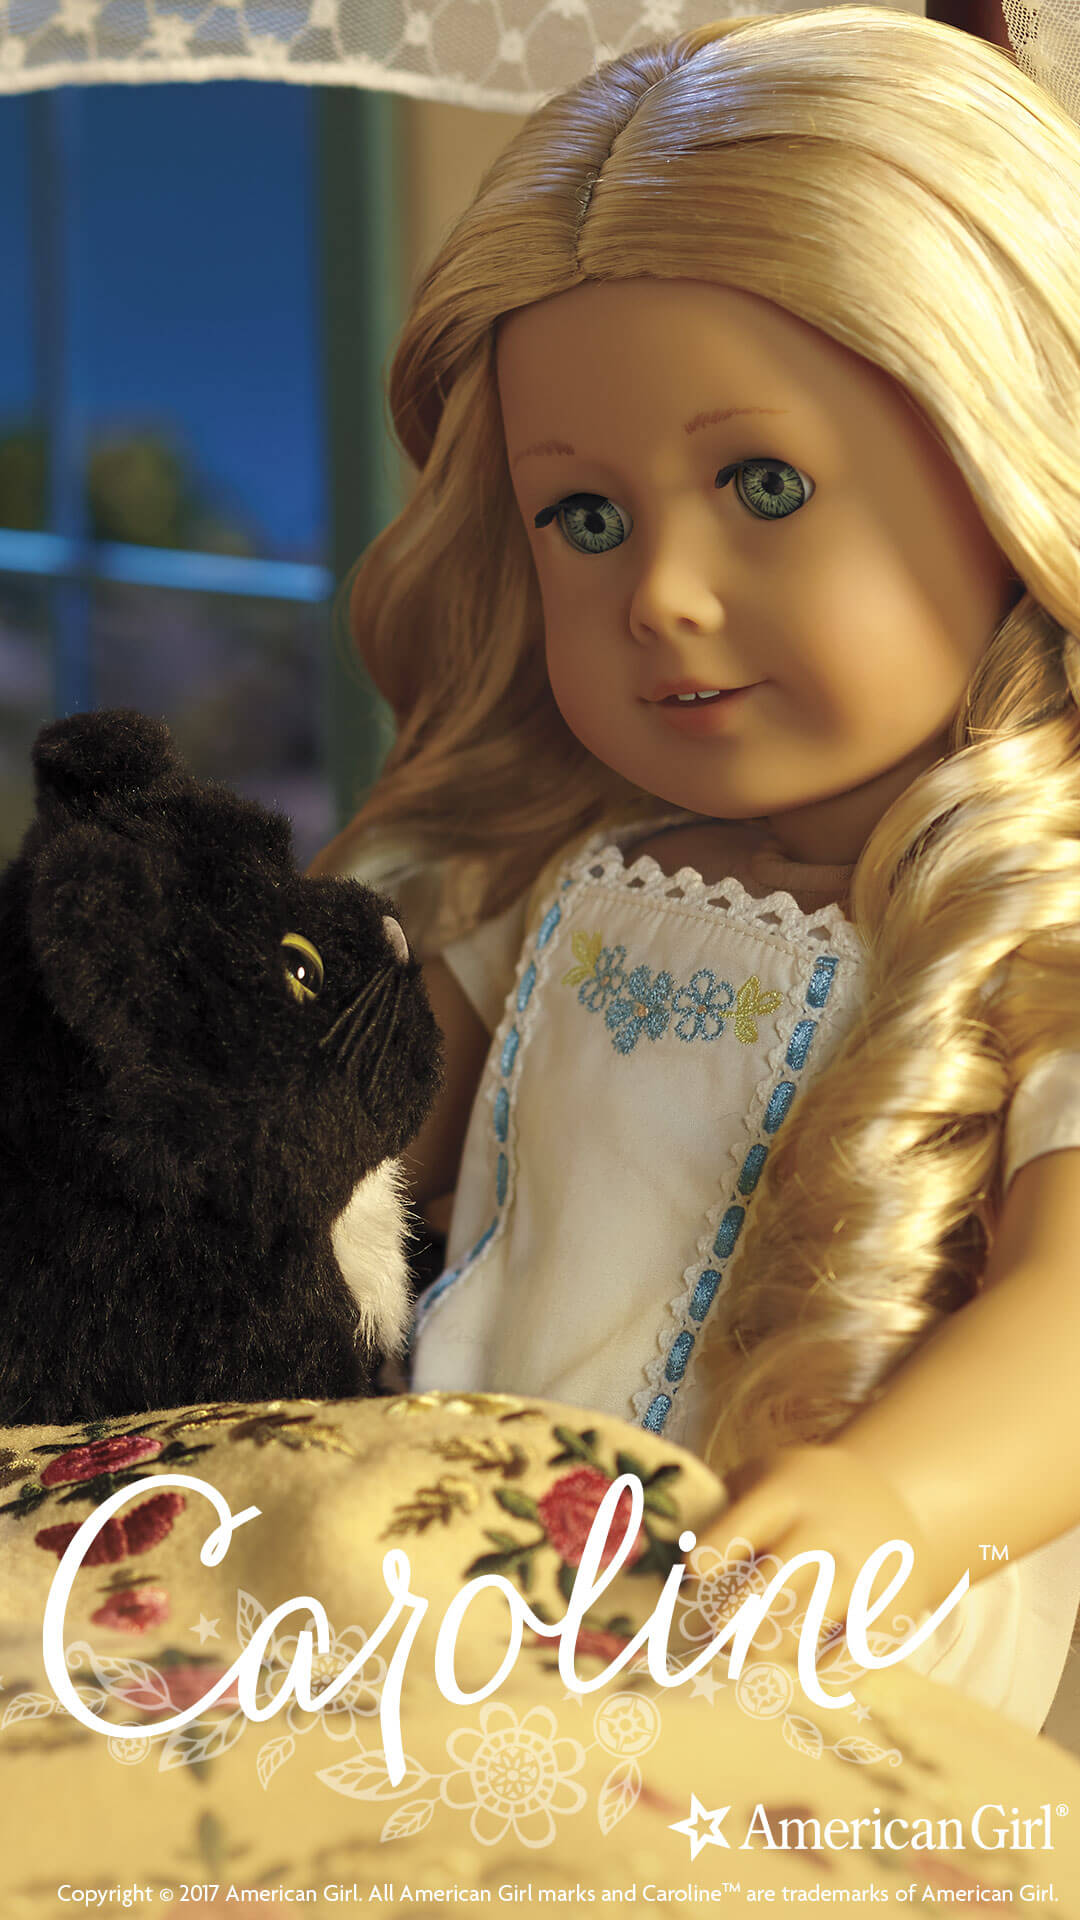 Caroline S 37 Piece Capsule Wardrobe Creative Process: Play At American Girl